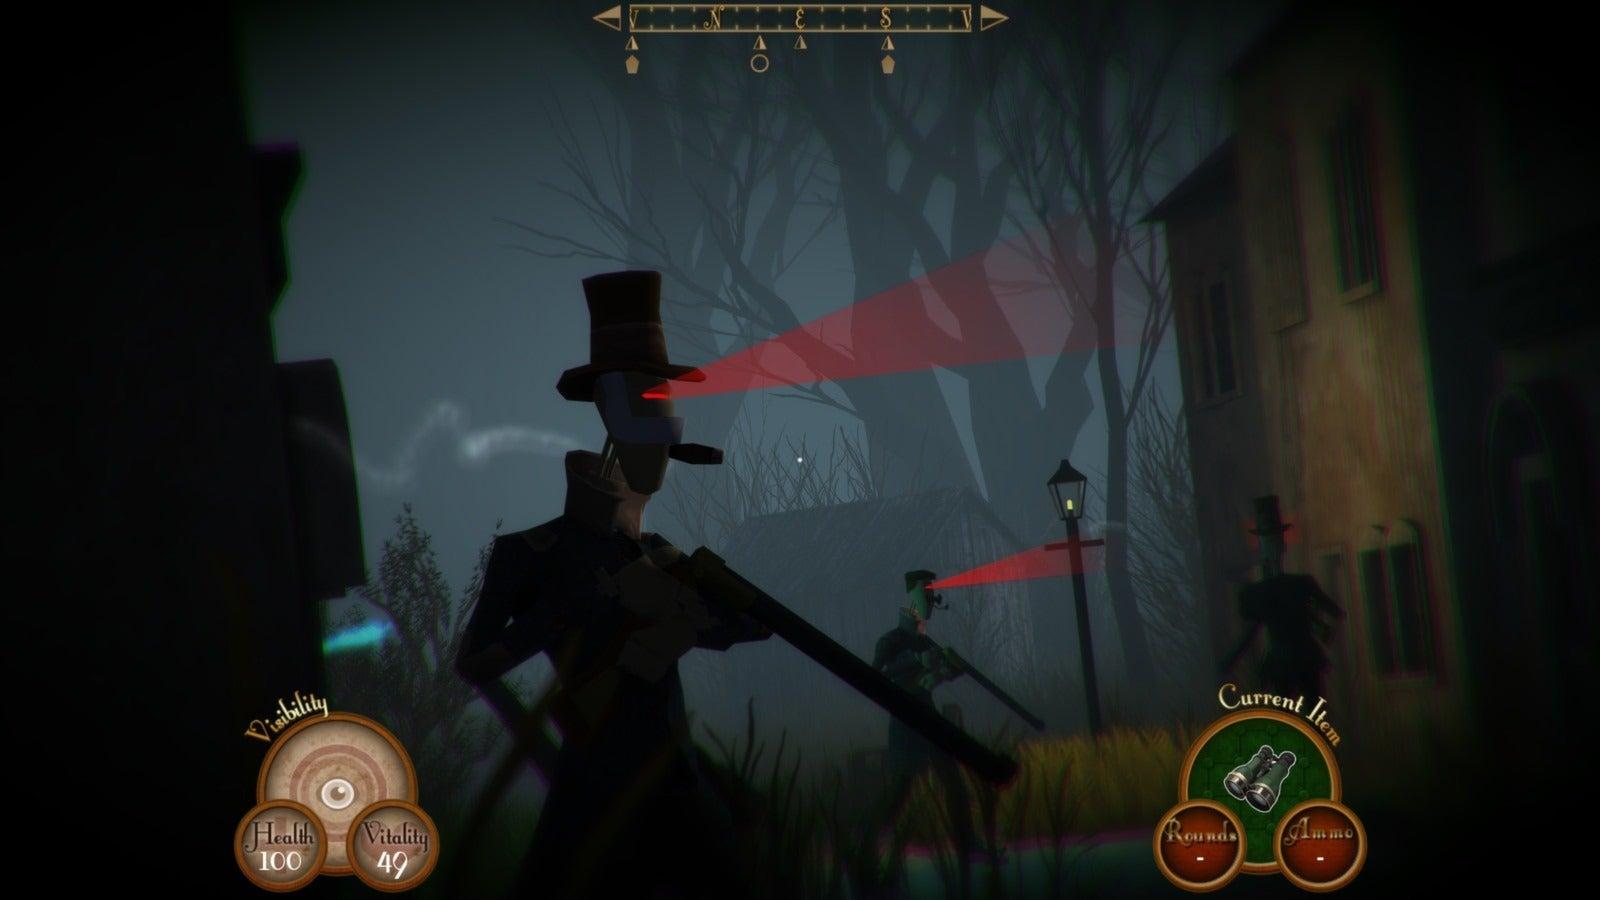 Steam Halloween Sale: The 13 best PC game deals | PCWorld